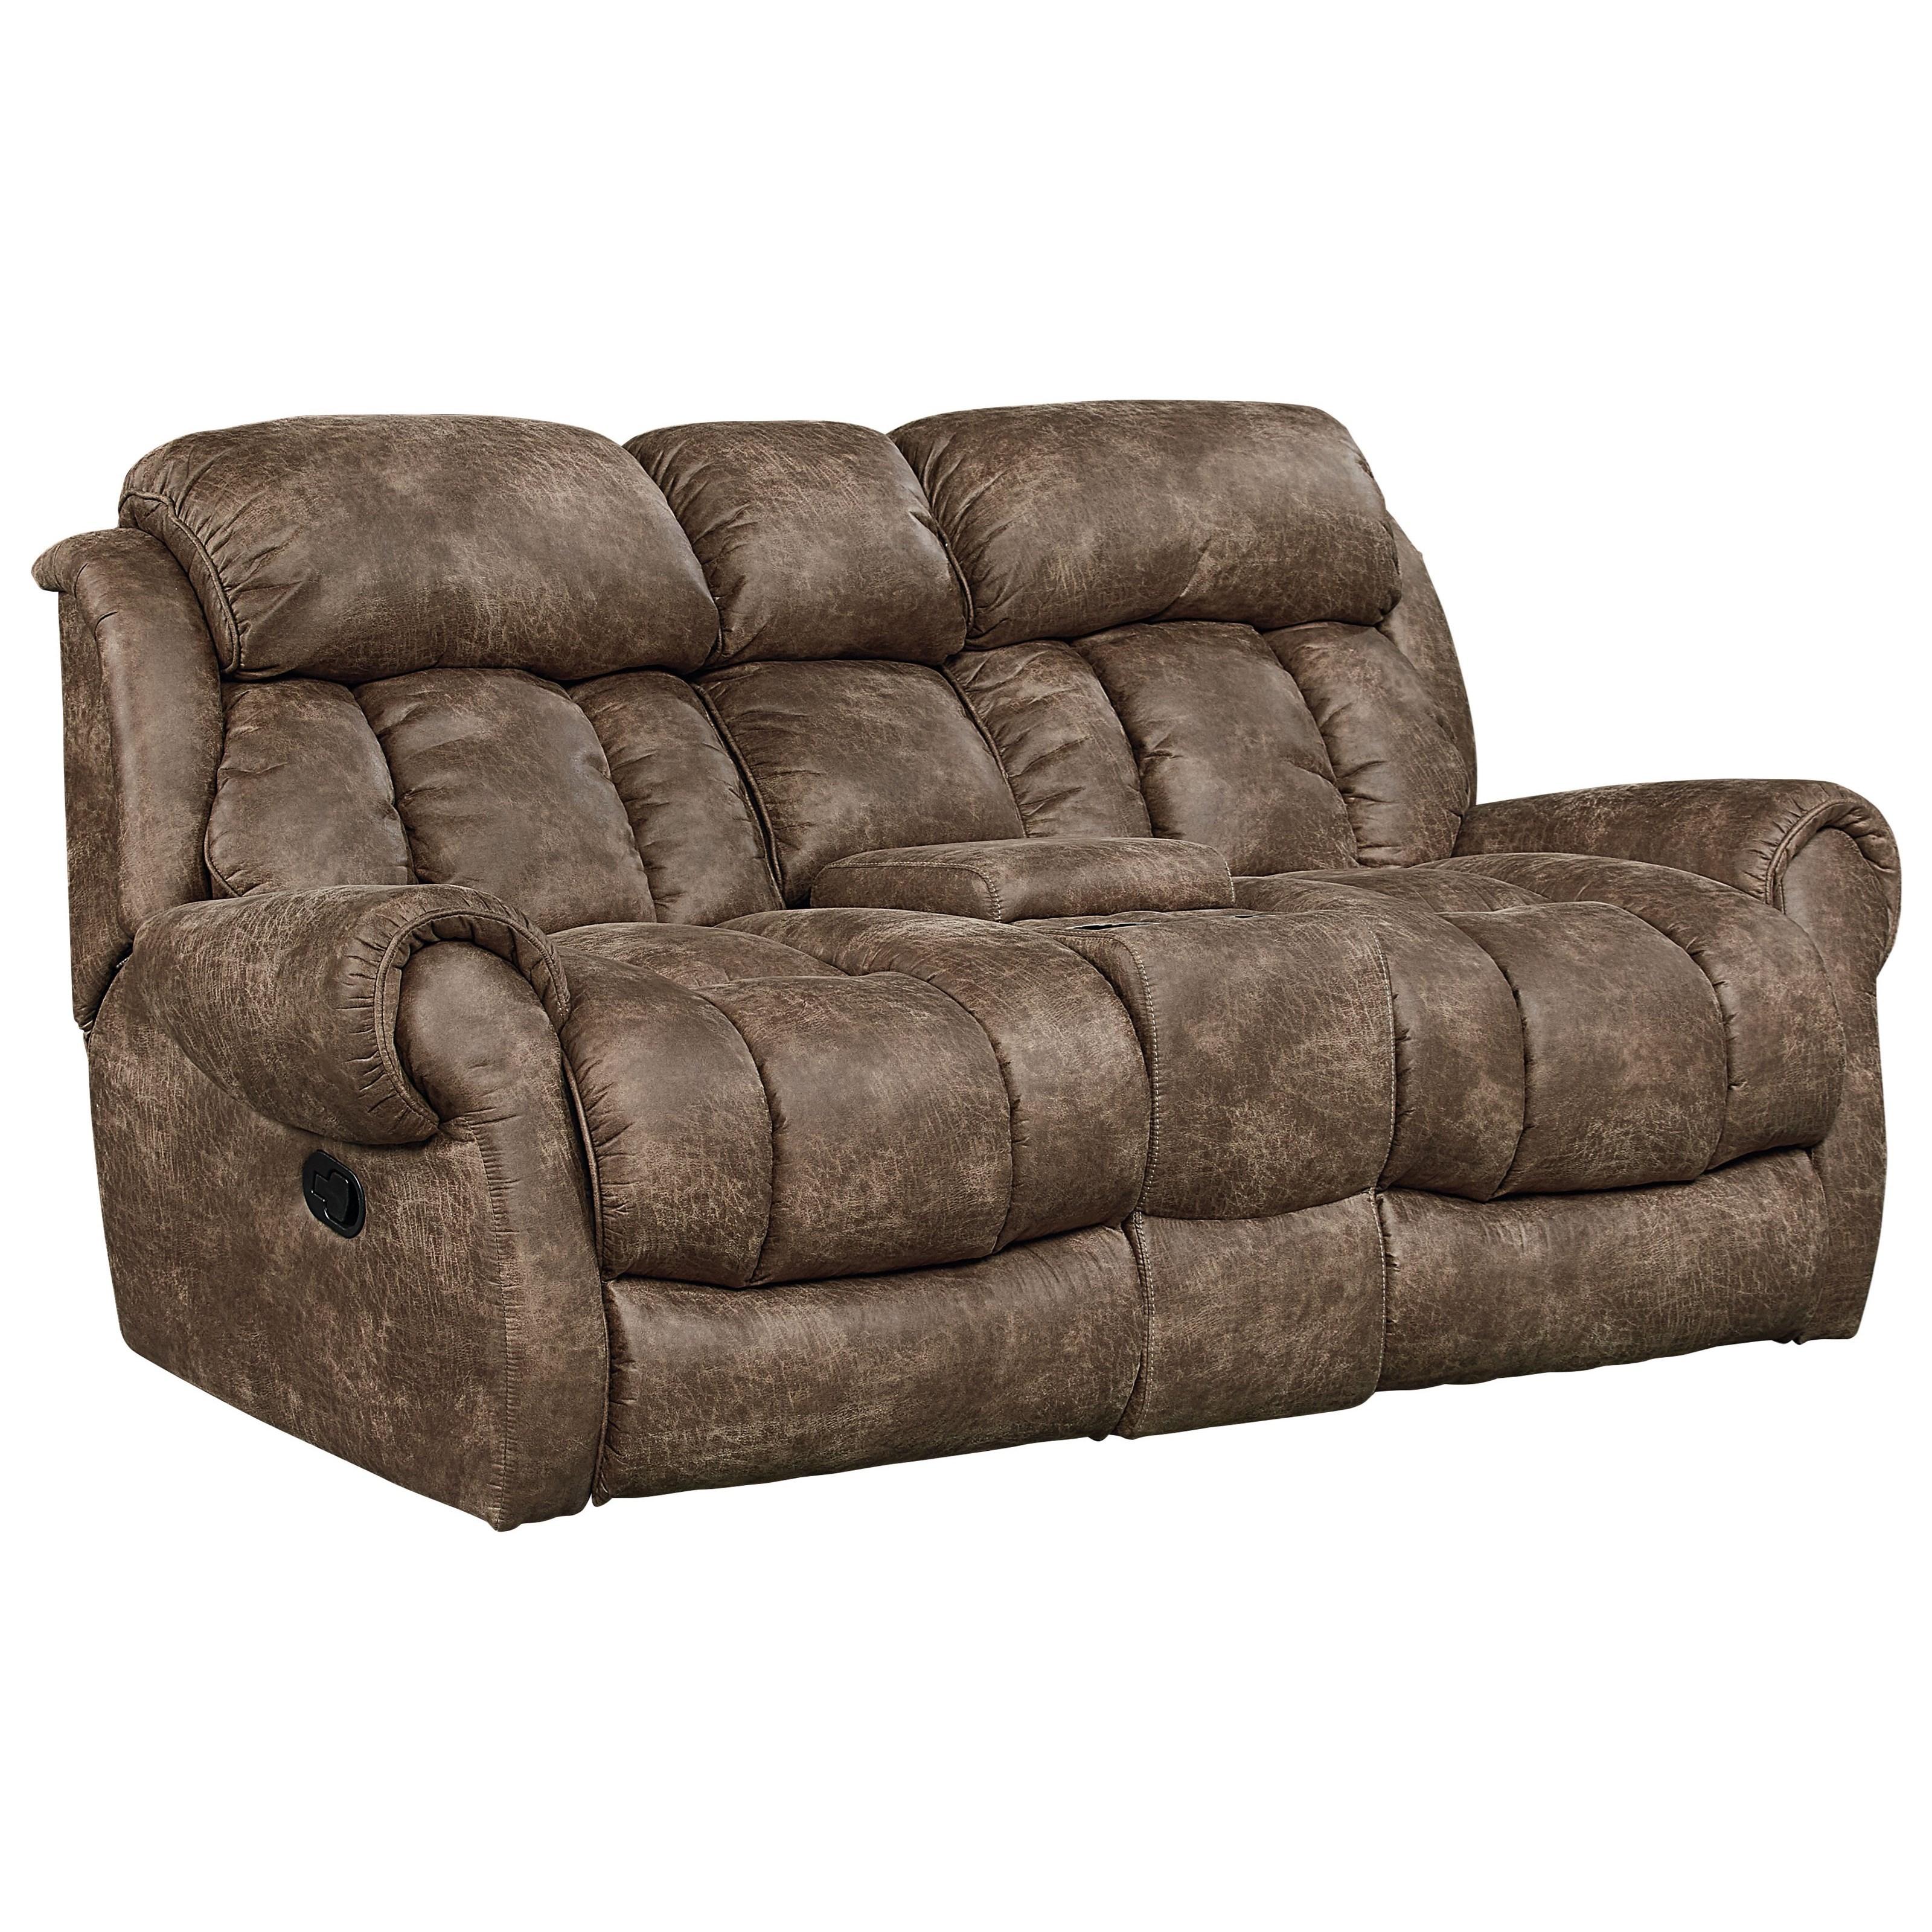 Standard Furniture Summit Reclining Loveseat - Item Number: 4001291